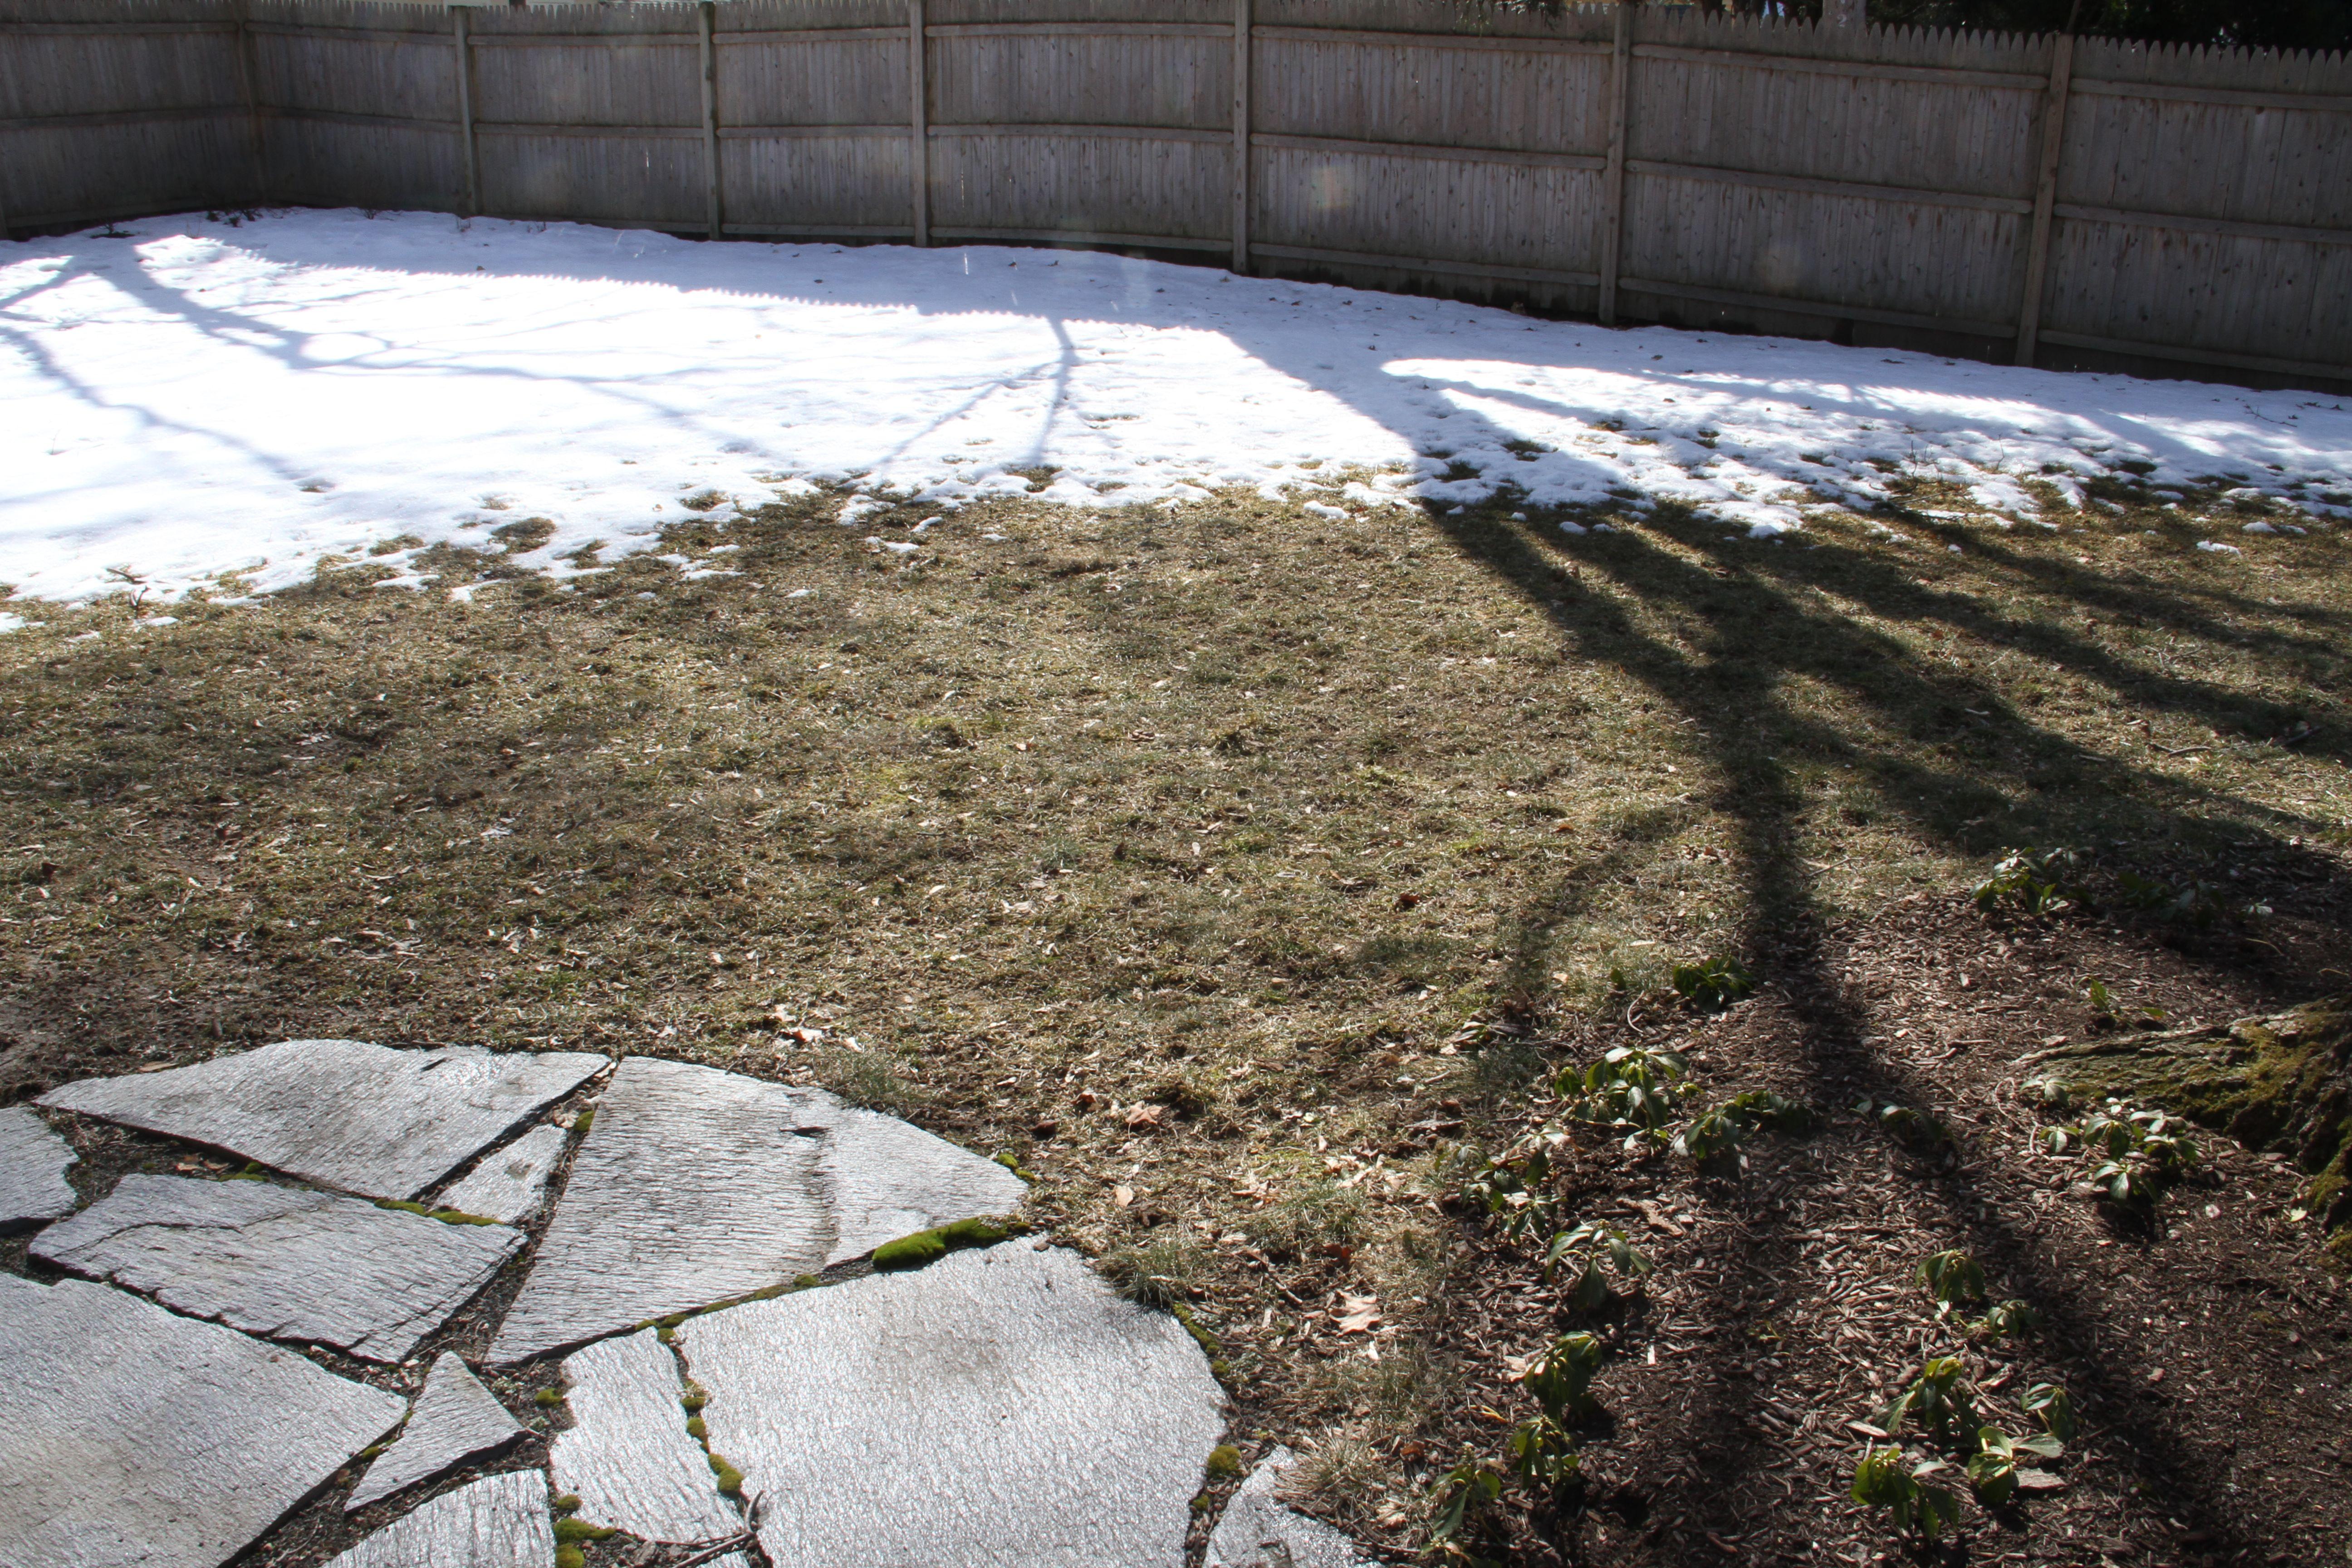 Beauty shot: snow, shadows, sunshine, emerging growth. Spring is good.